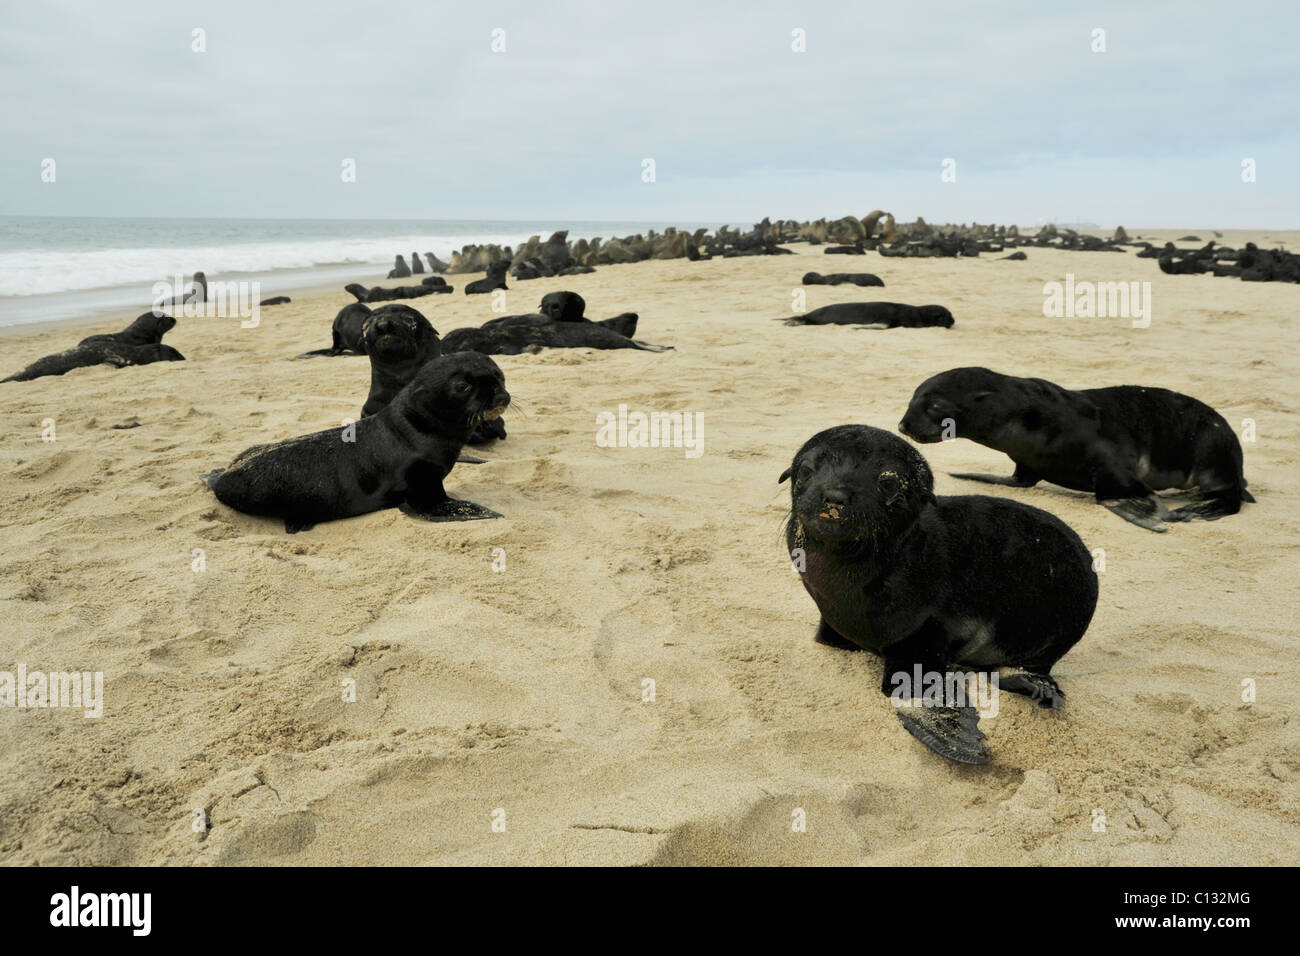 Scene of young baby Cape Fur Seal pups Arctocephalus pusilus on beach coast of Namibia Wildlife nature animals nursery - Stock Image